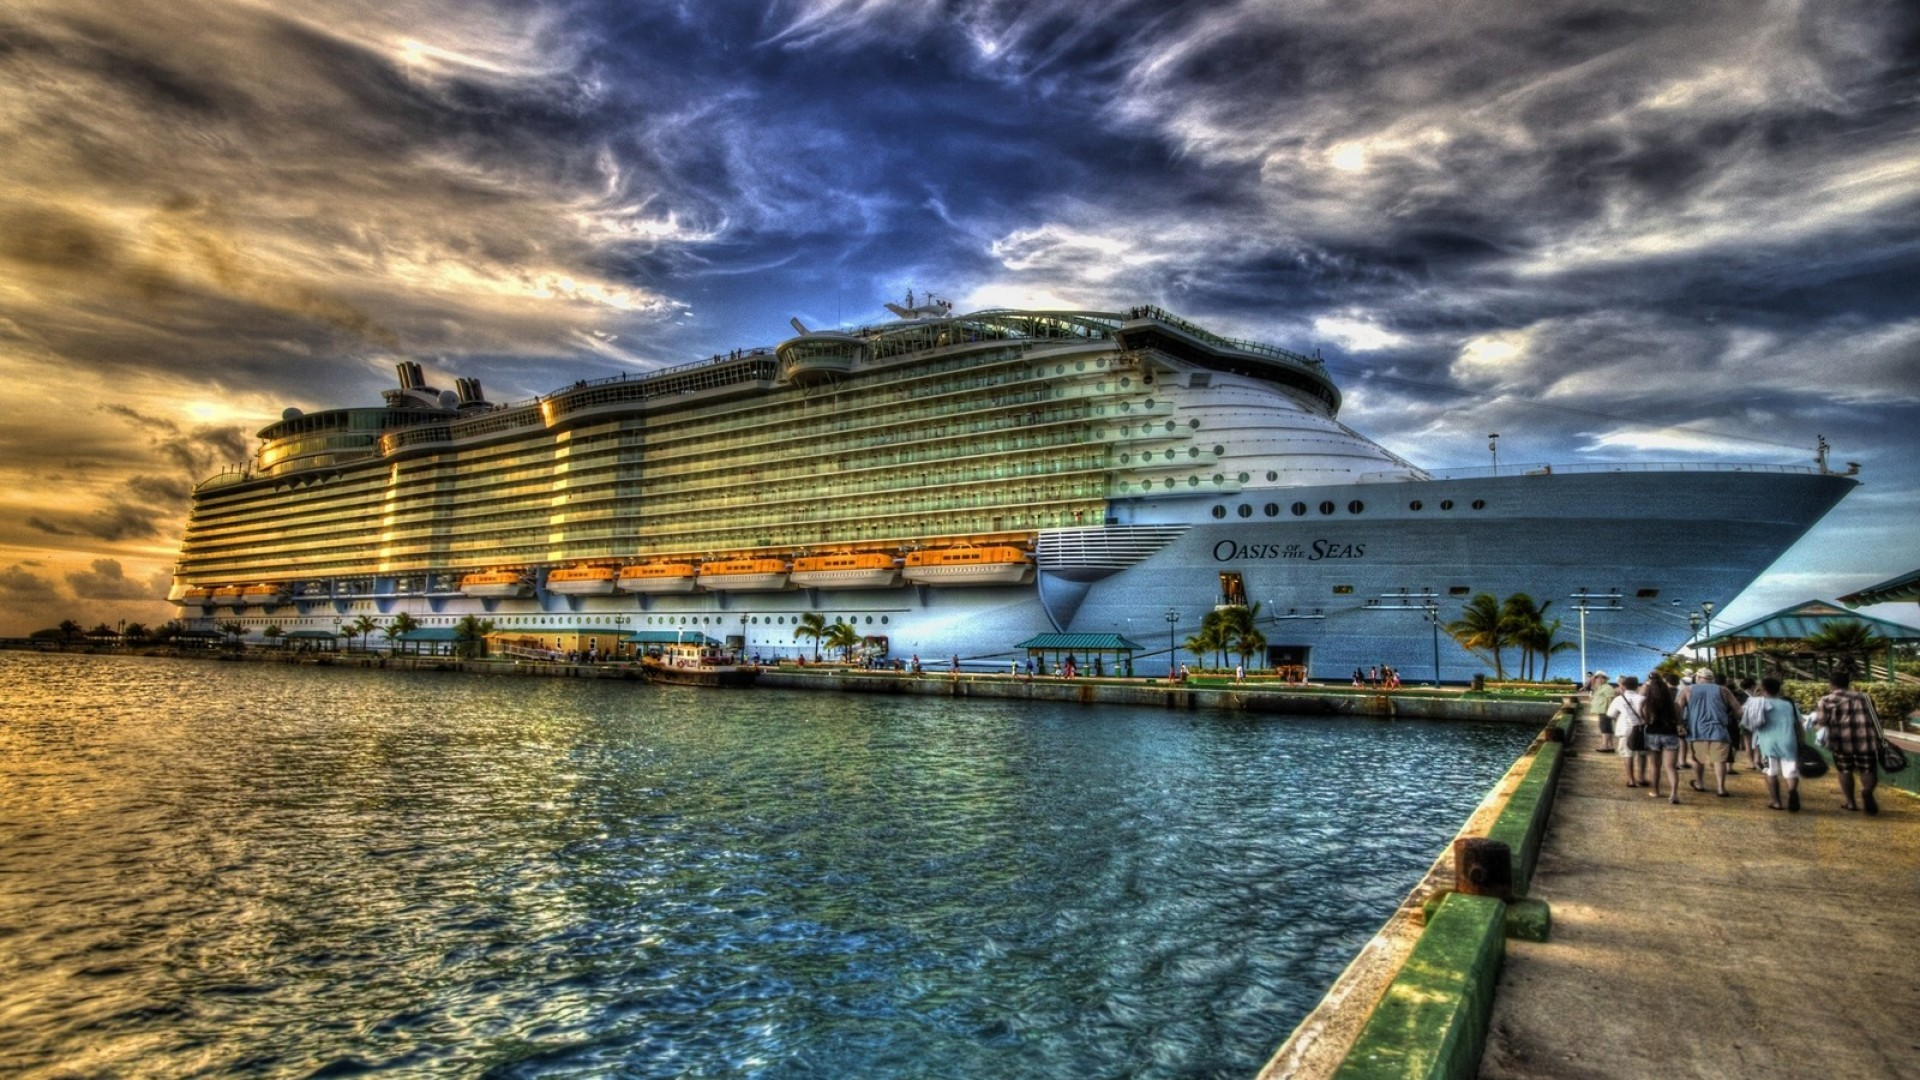 Carnival cruise ship wallpaper 64 images - Carnival wallpaper ...